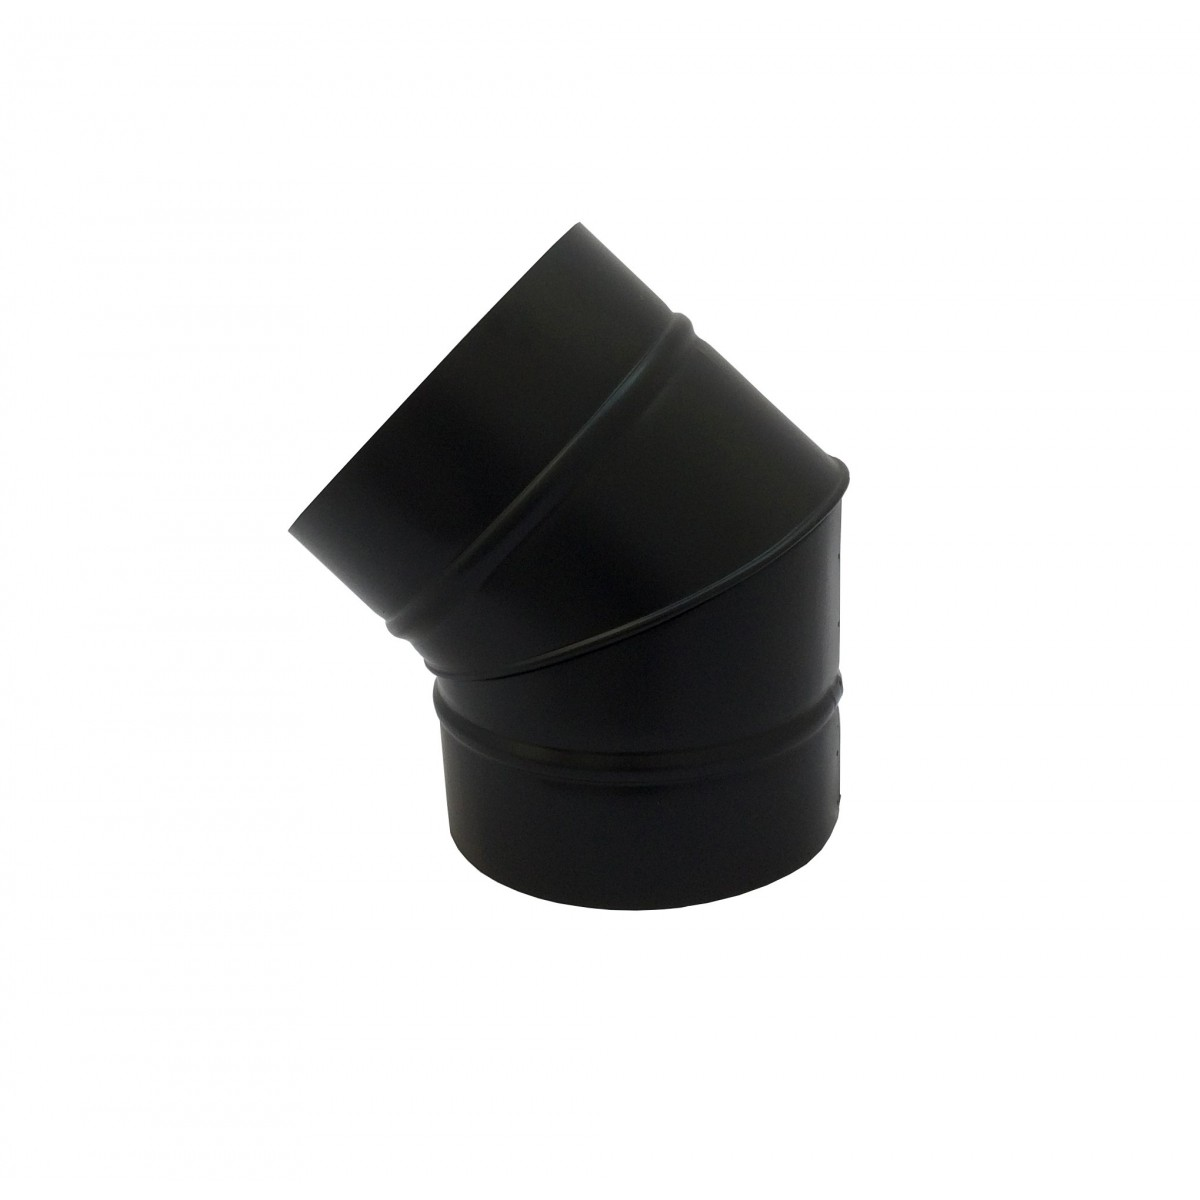 Curva 45° preta de 115 mm de diâmetro  - Galvocalhas